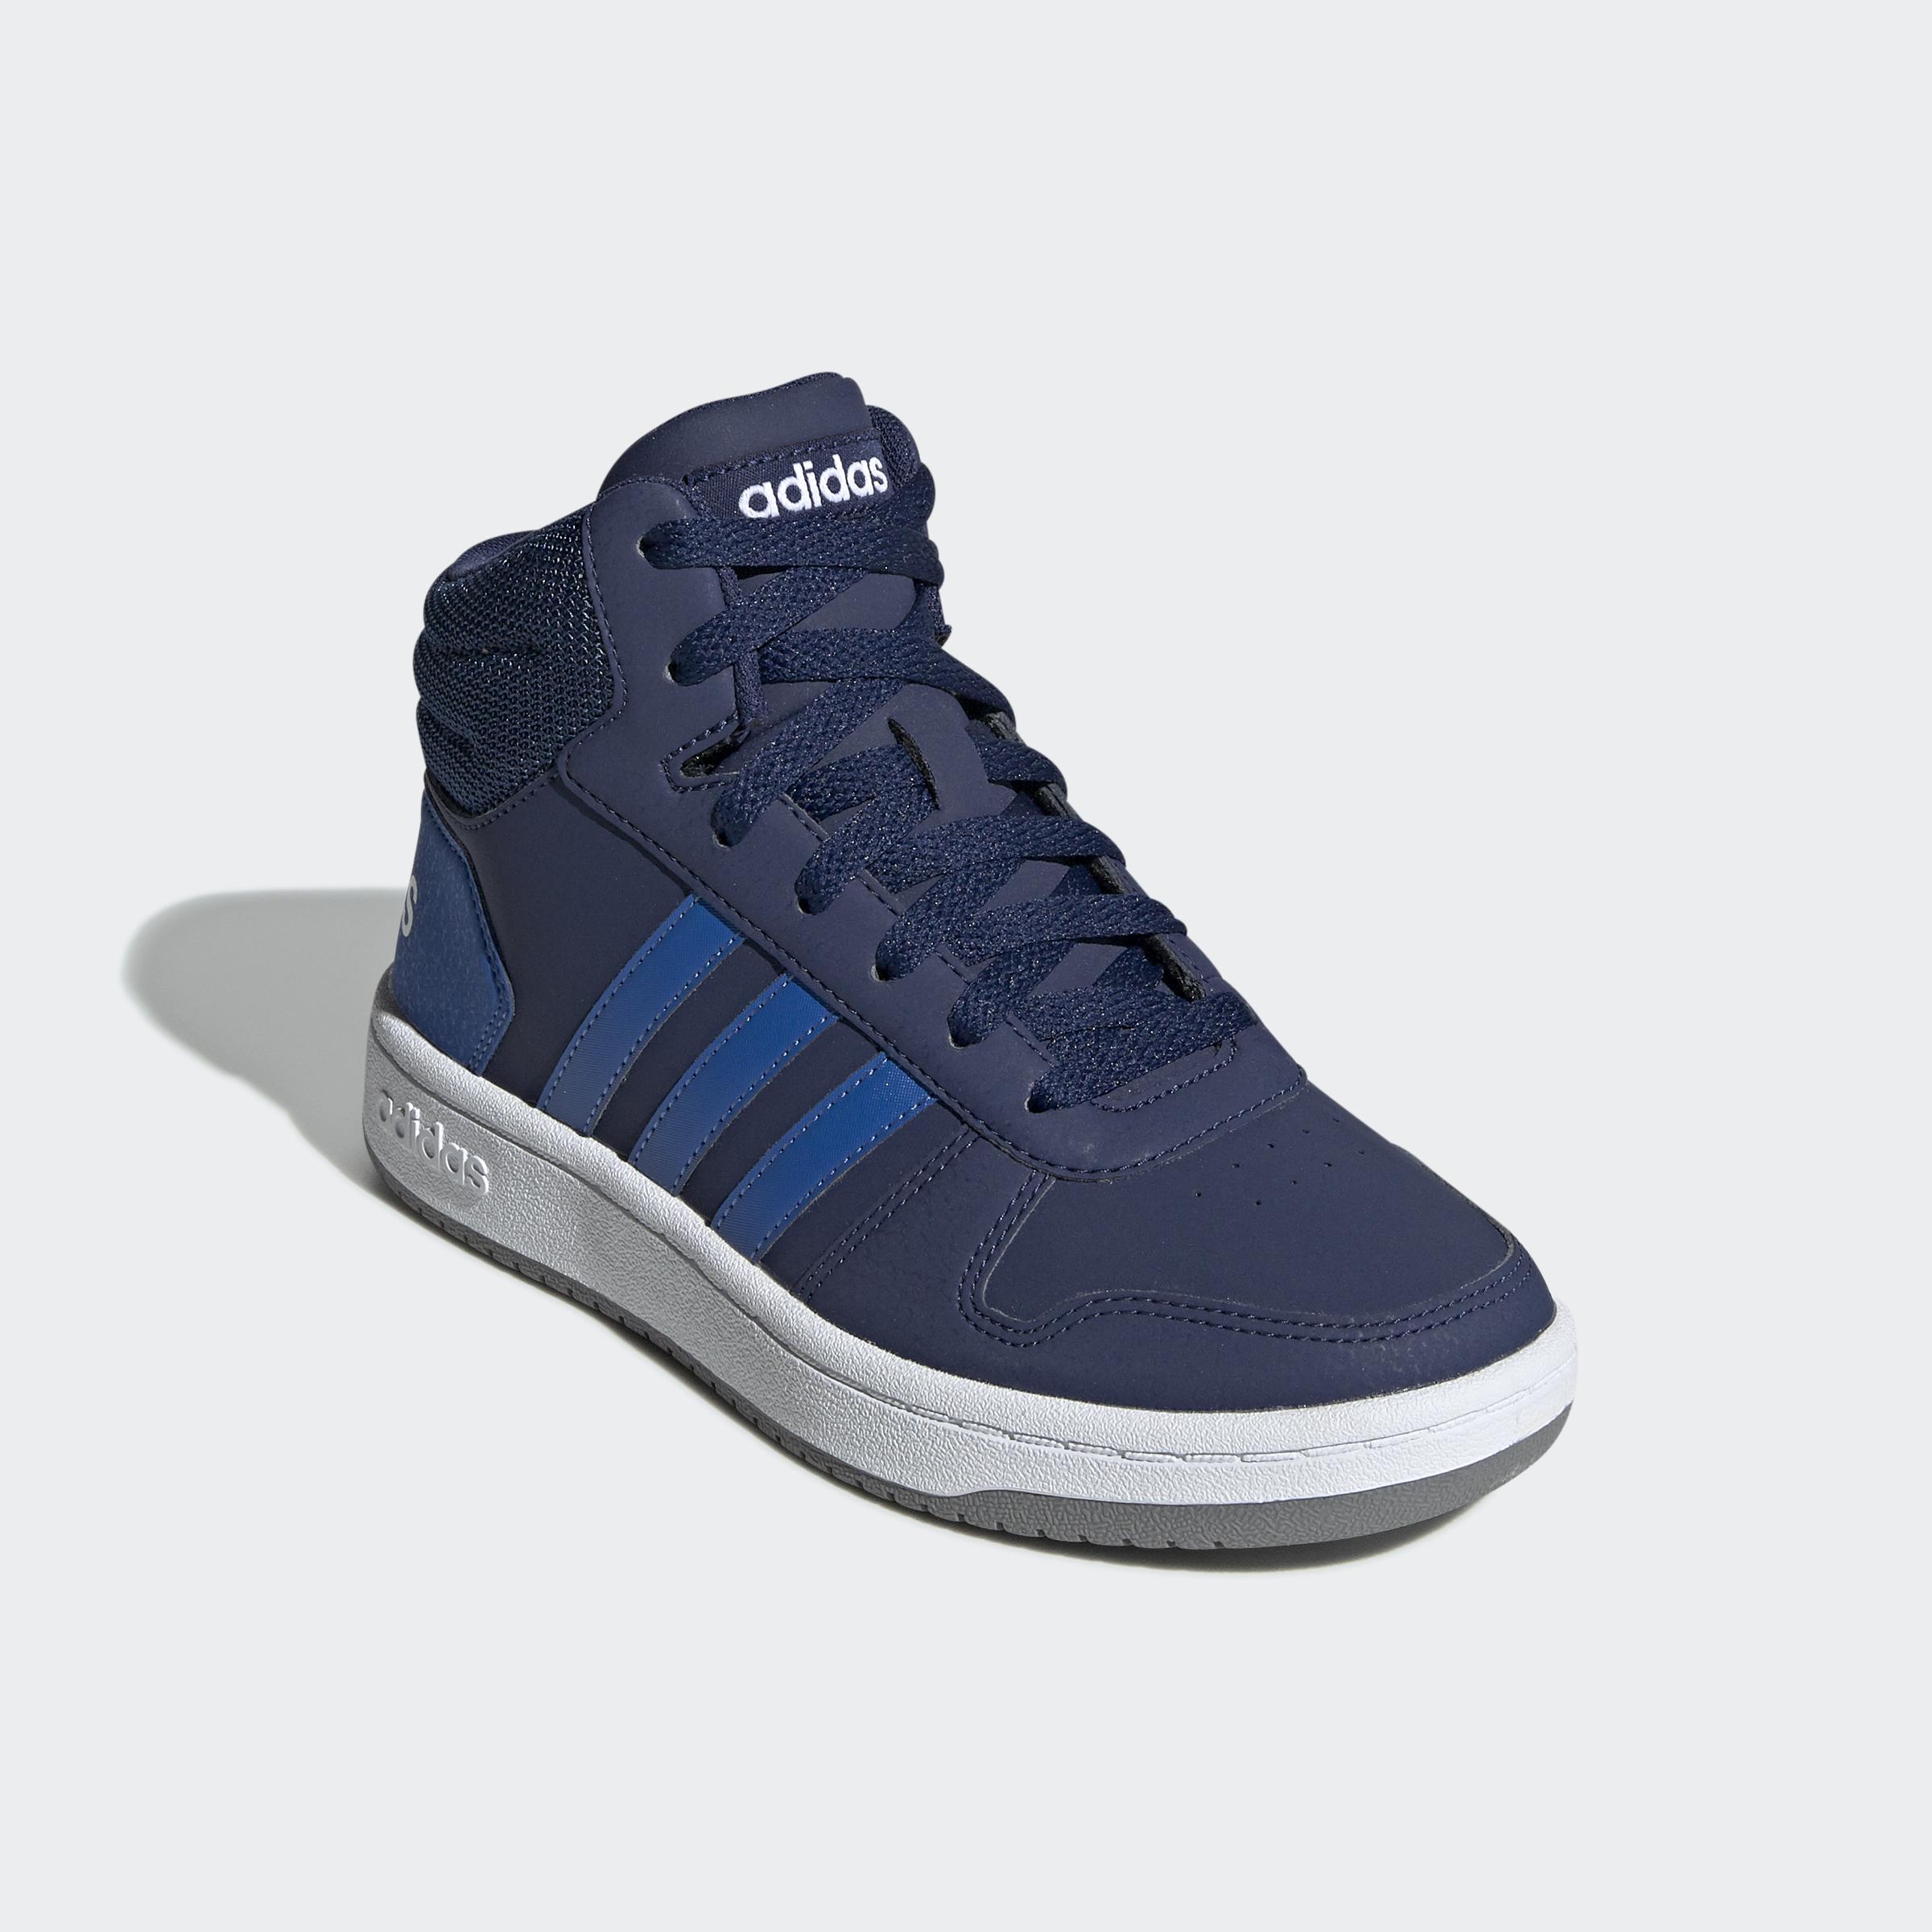 adidas-Hoops-2-0-Mid-Shoes-Kids-039-High-Tops thumbnail 15